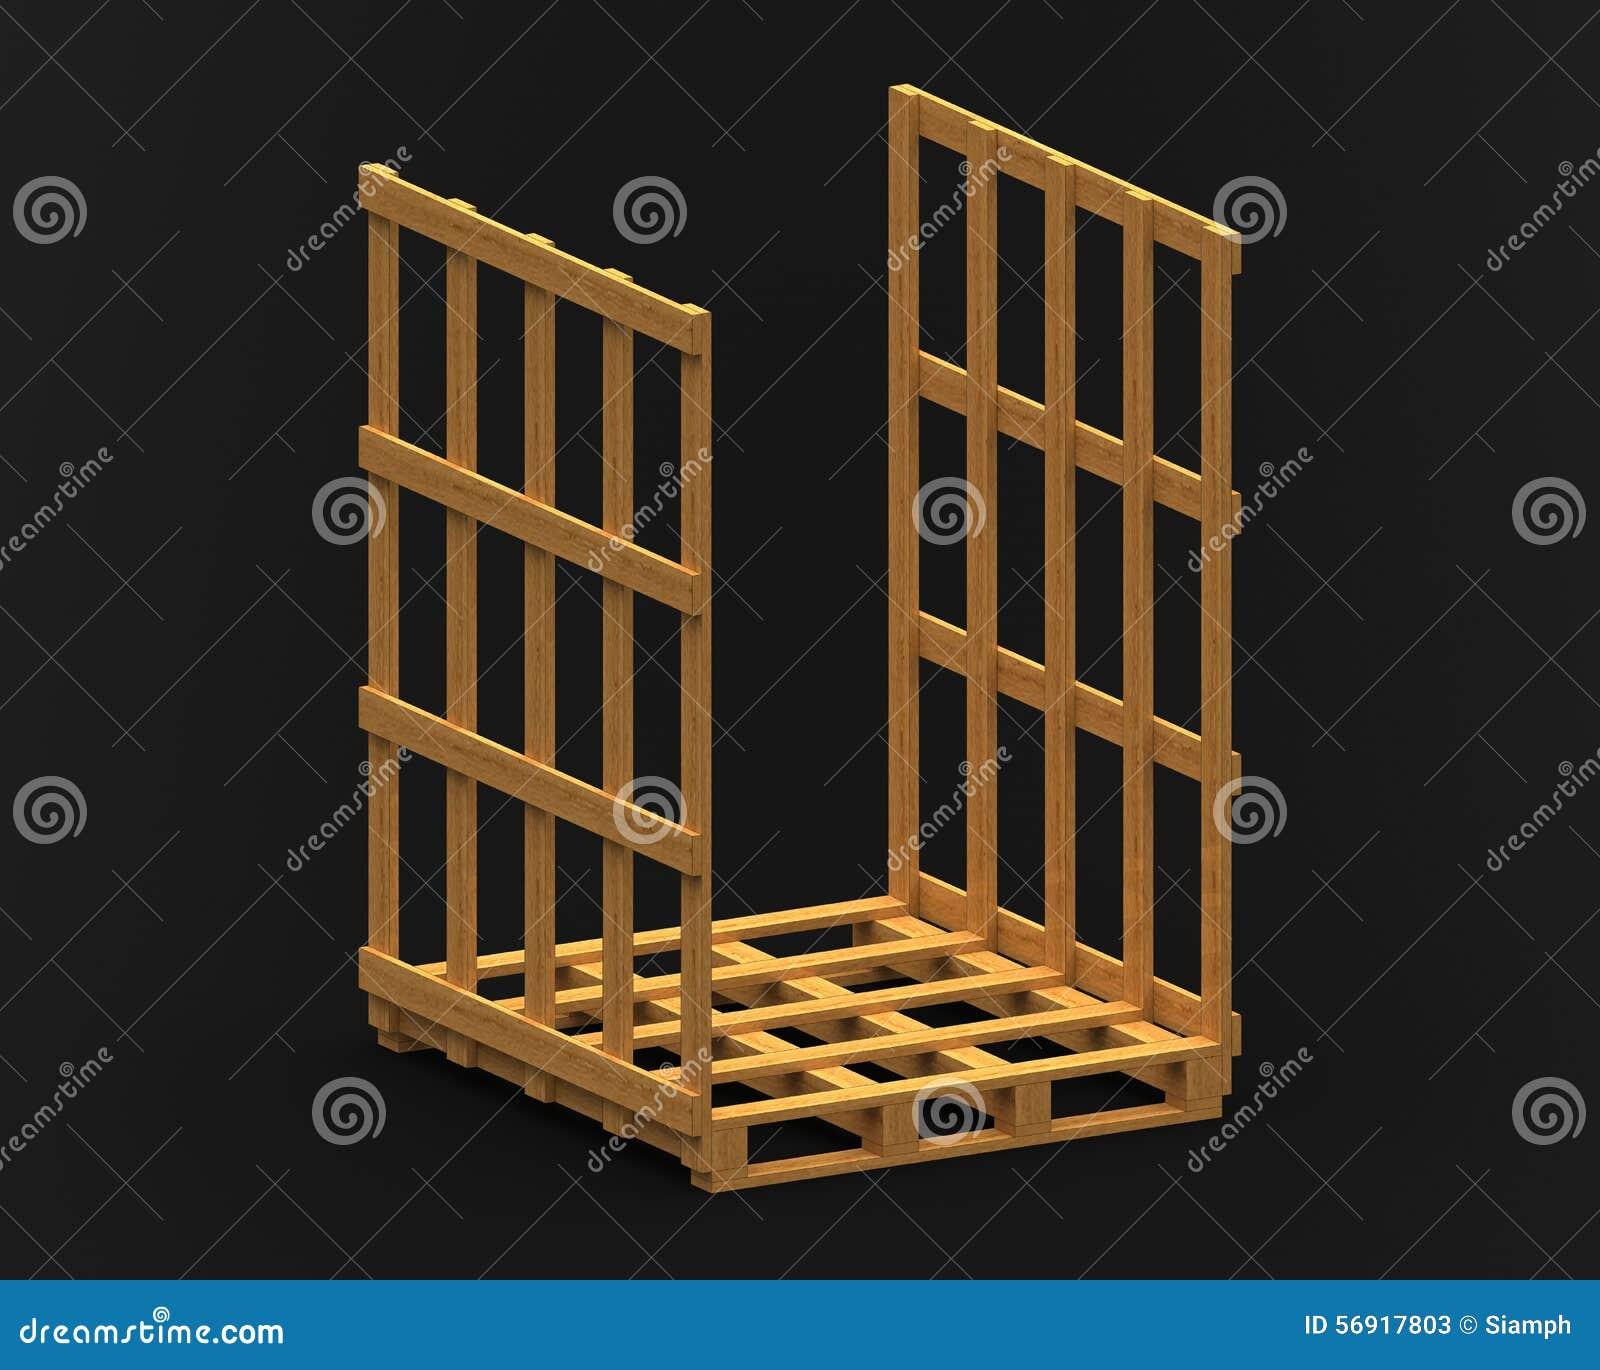 la palette en bois avec le cadre bilat ral 3d rendent. Black Bedroom Furniture Sets. Home Design Ideas